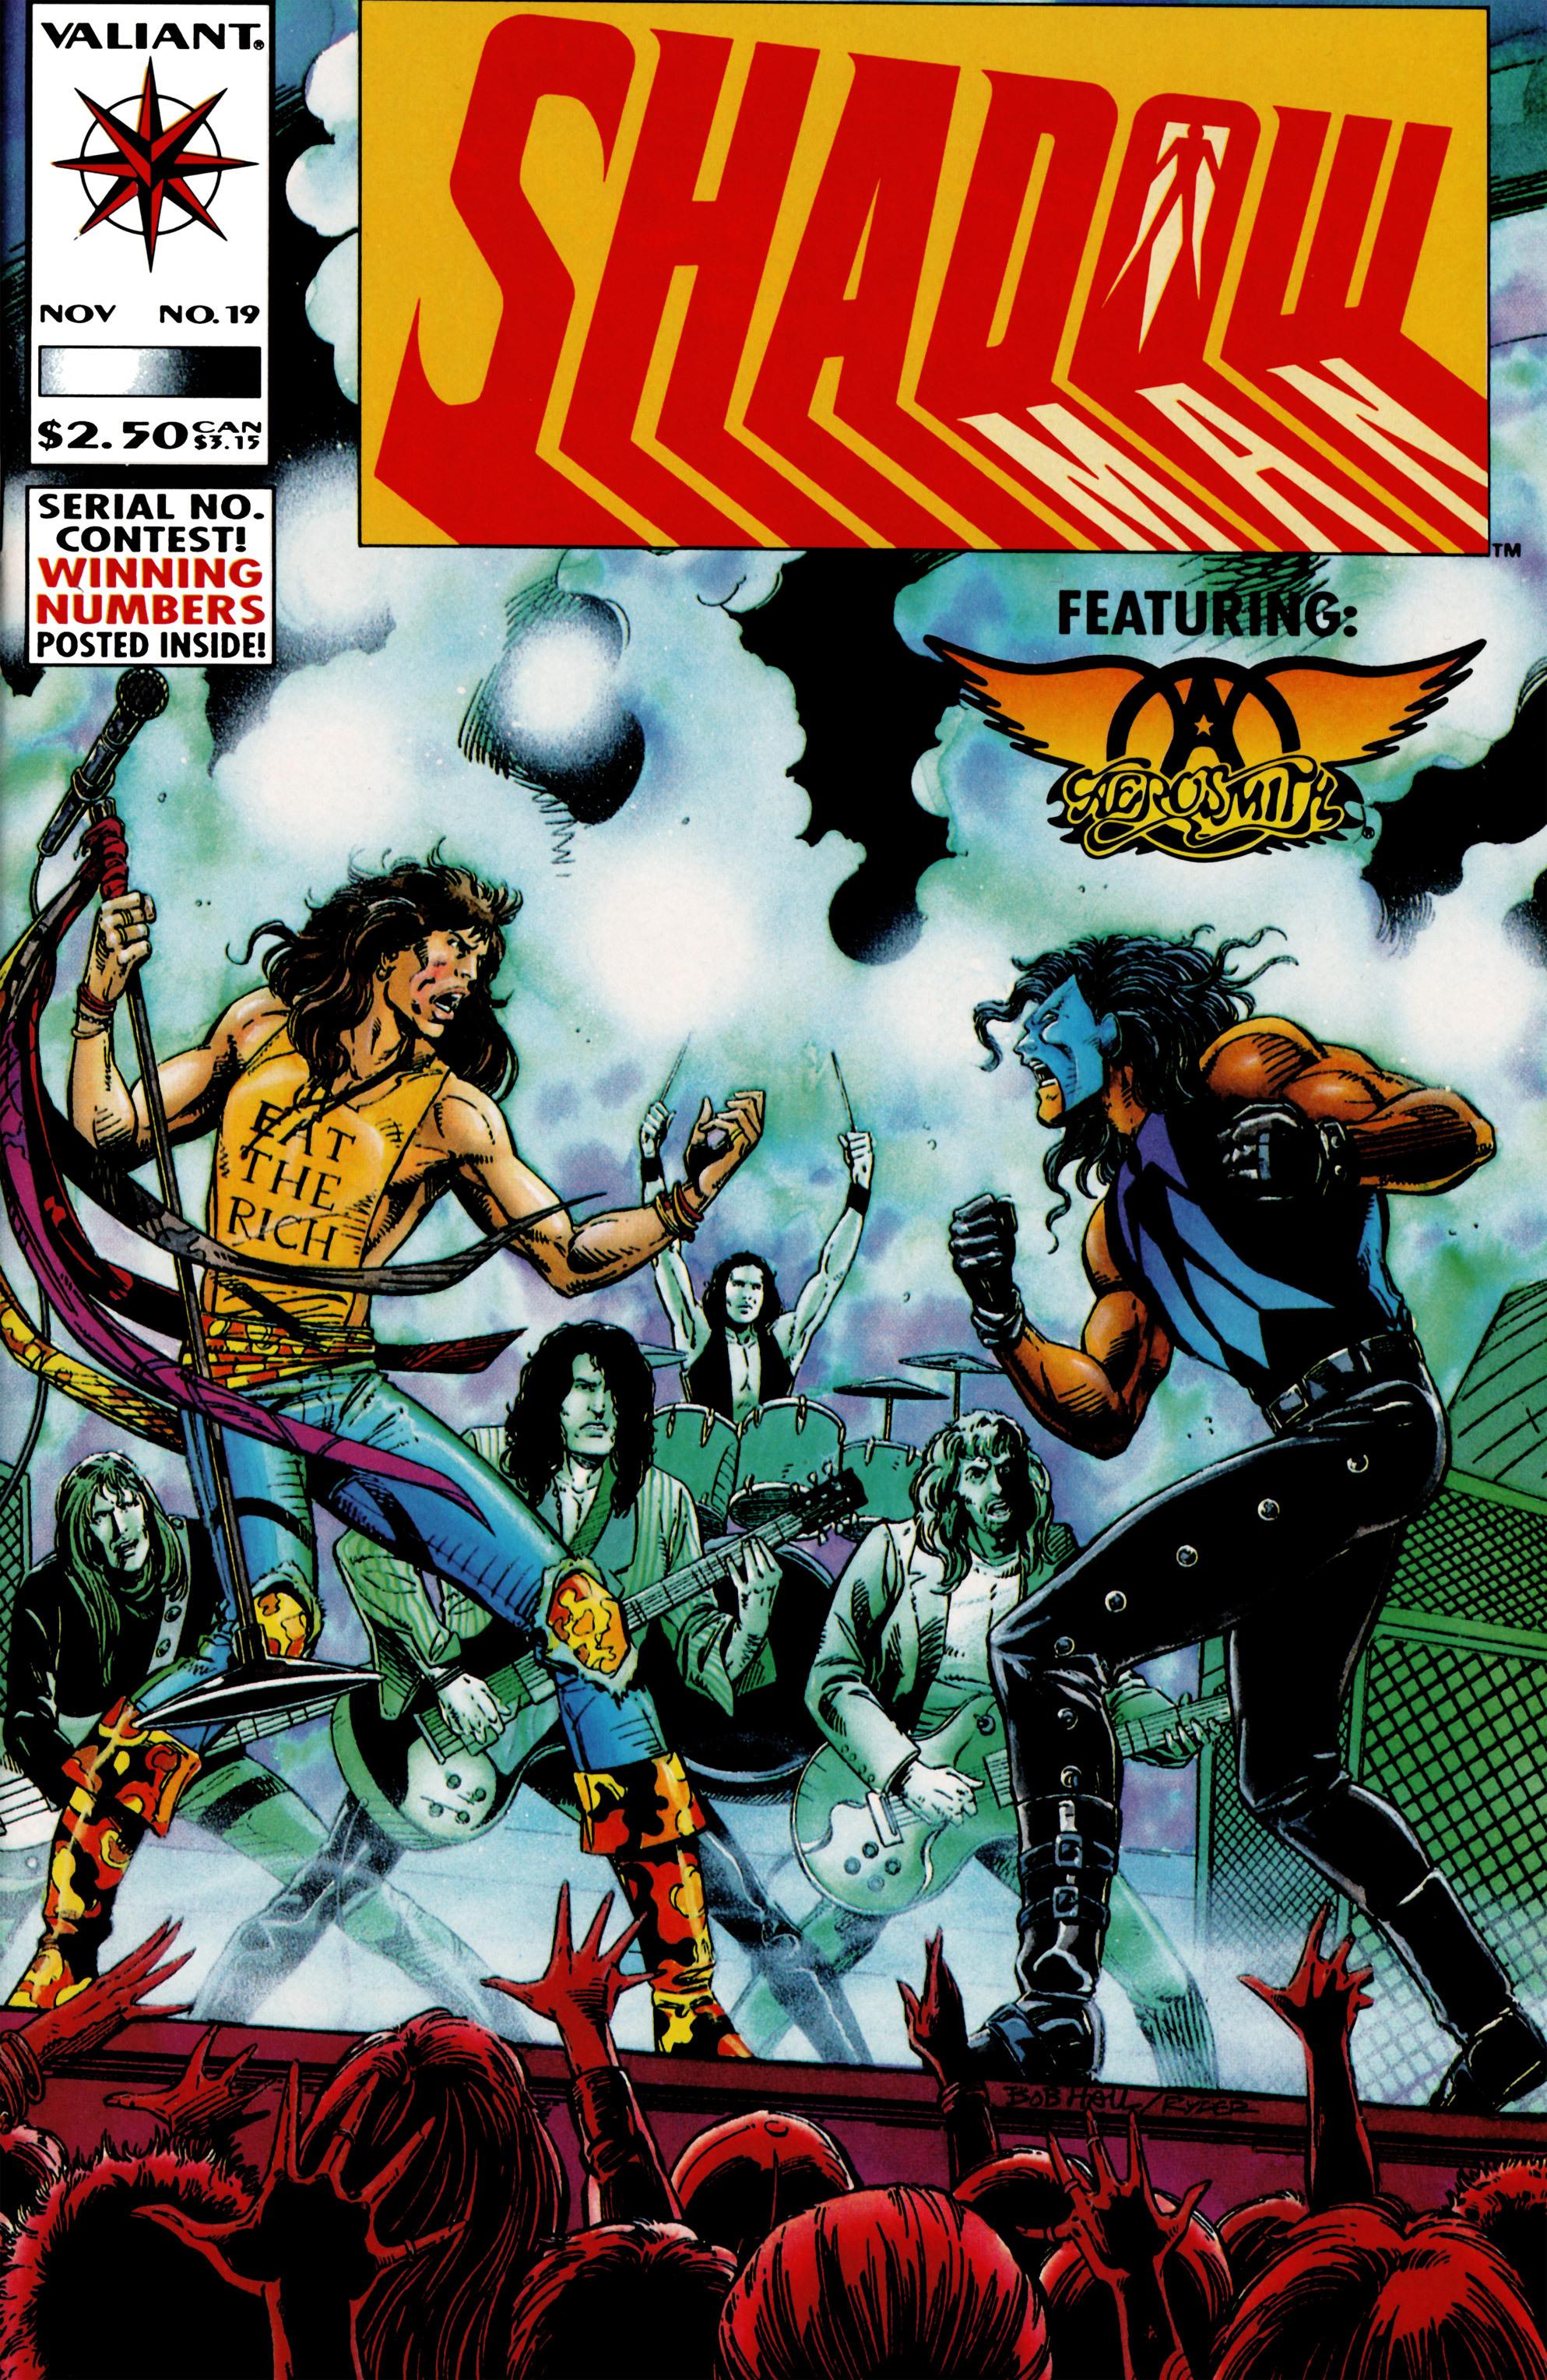 Read online Shadowman (1992) comic -  Issue #19 - 1